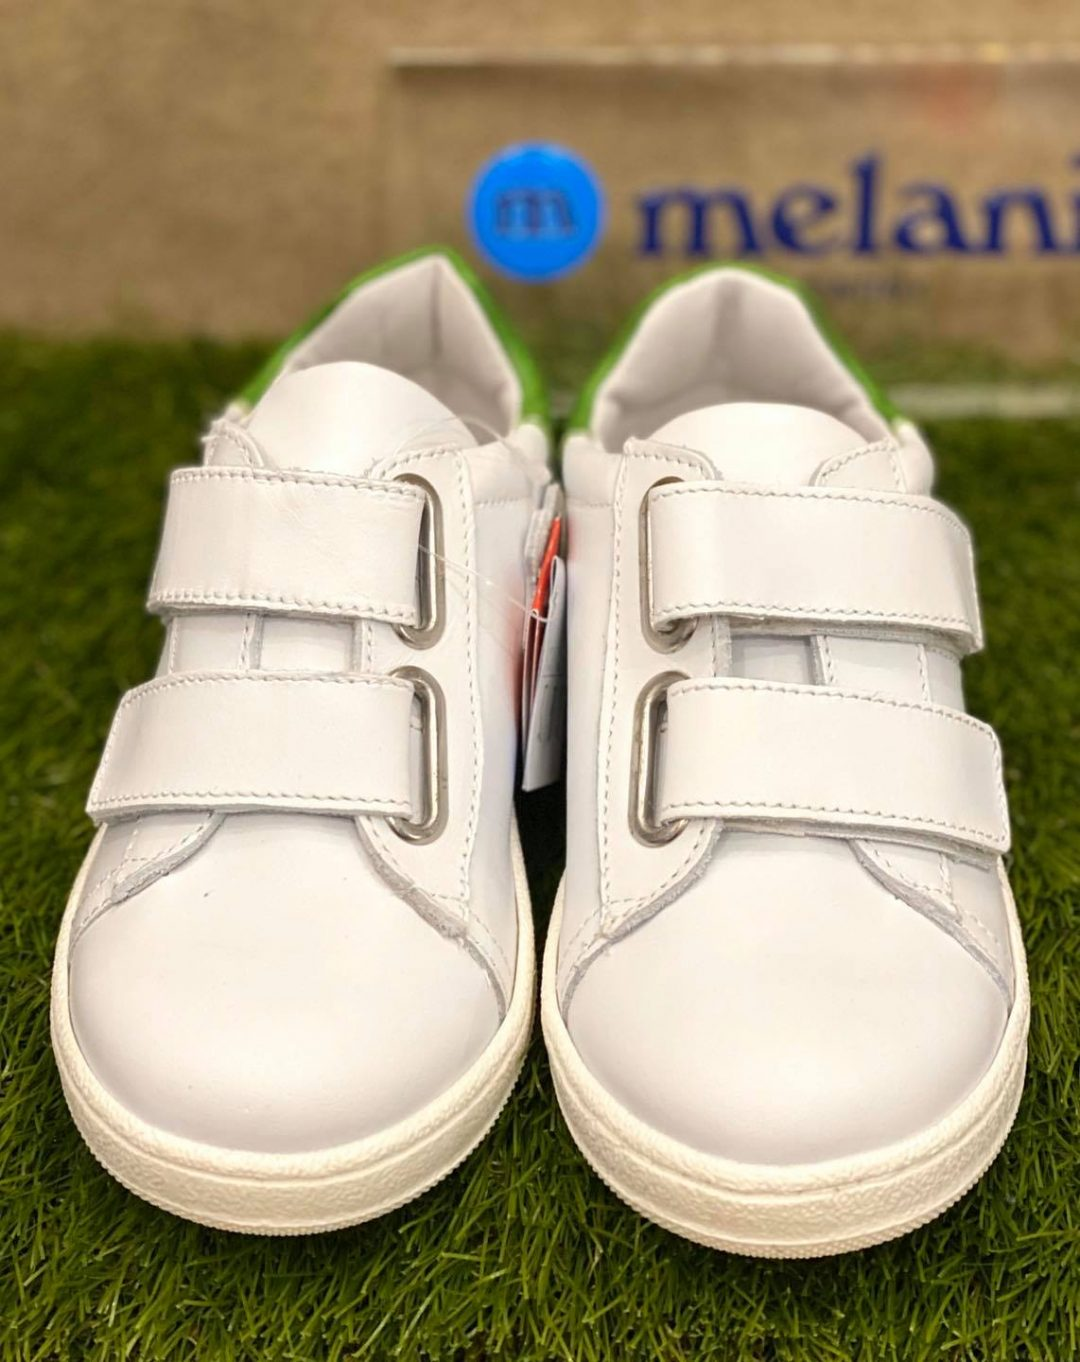 Scarpe bambino bianche melania